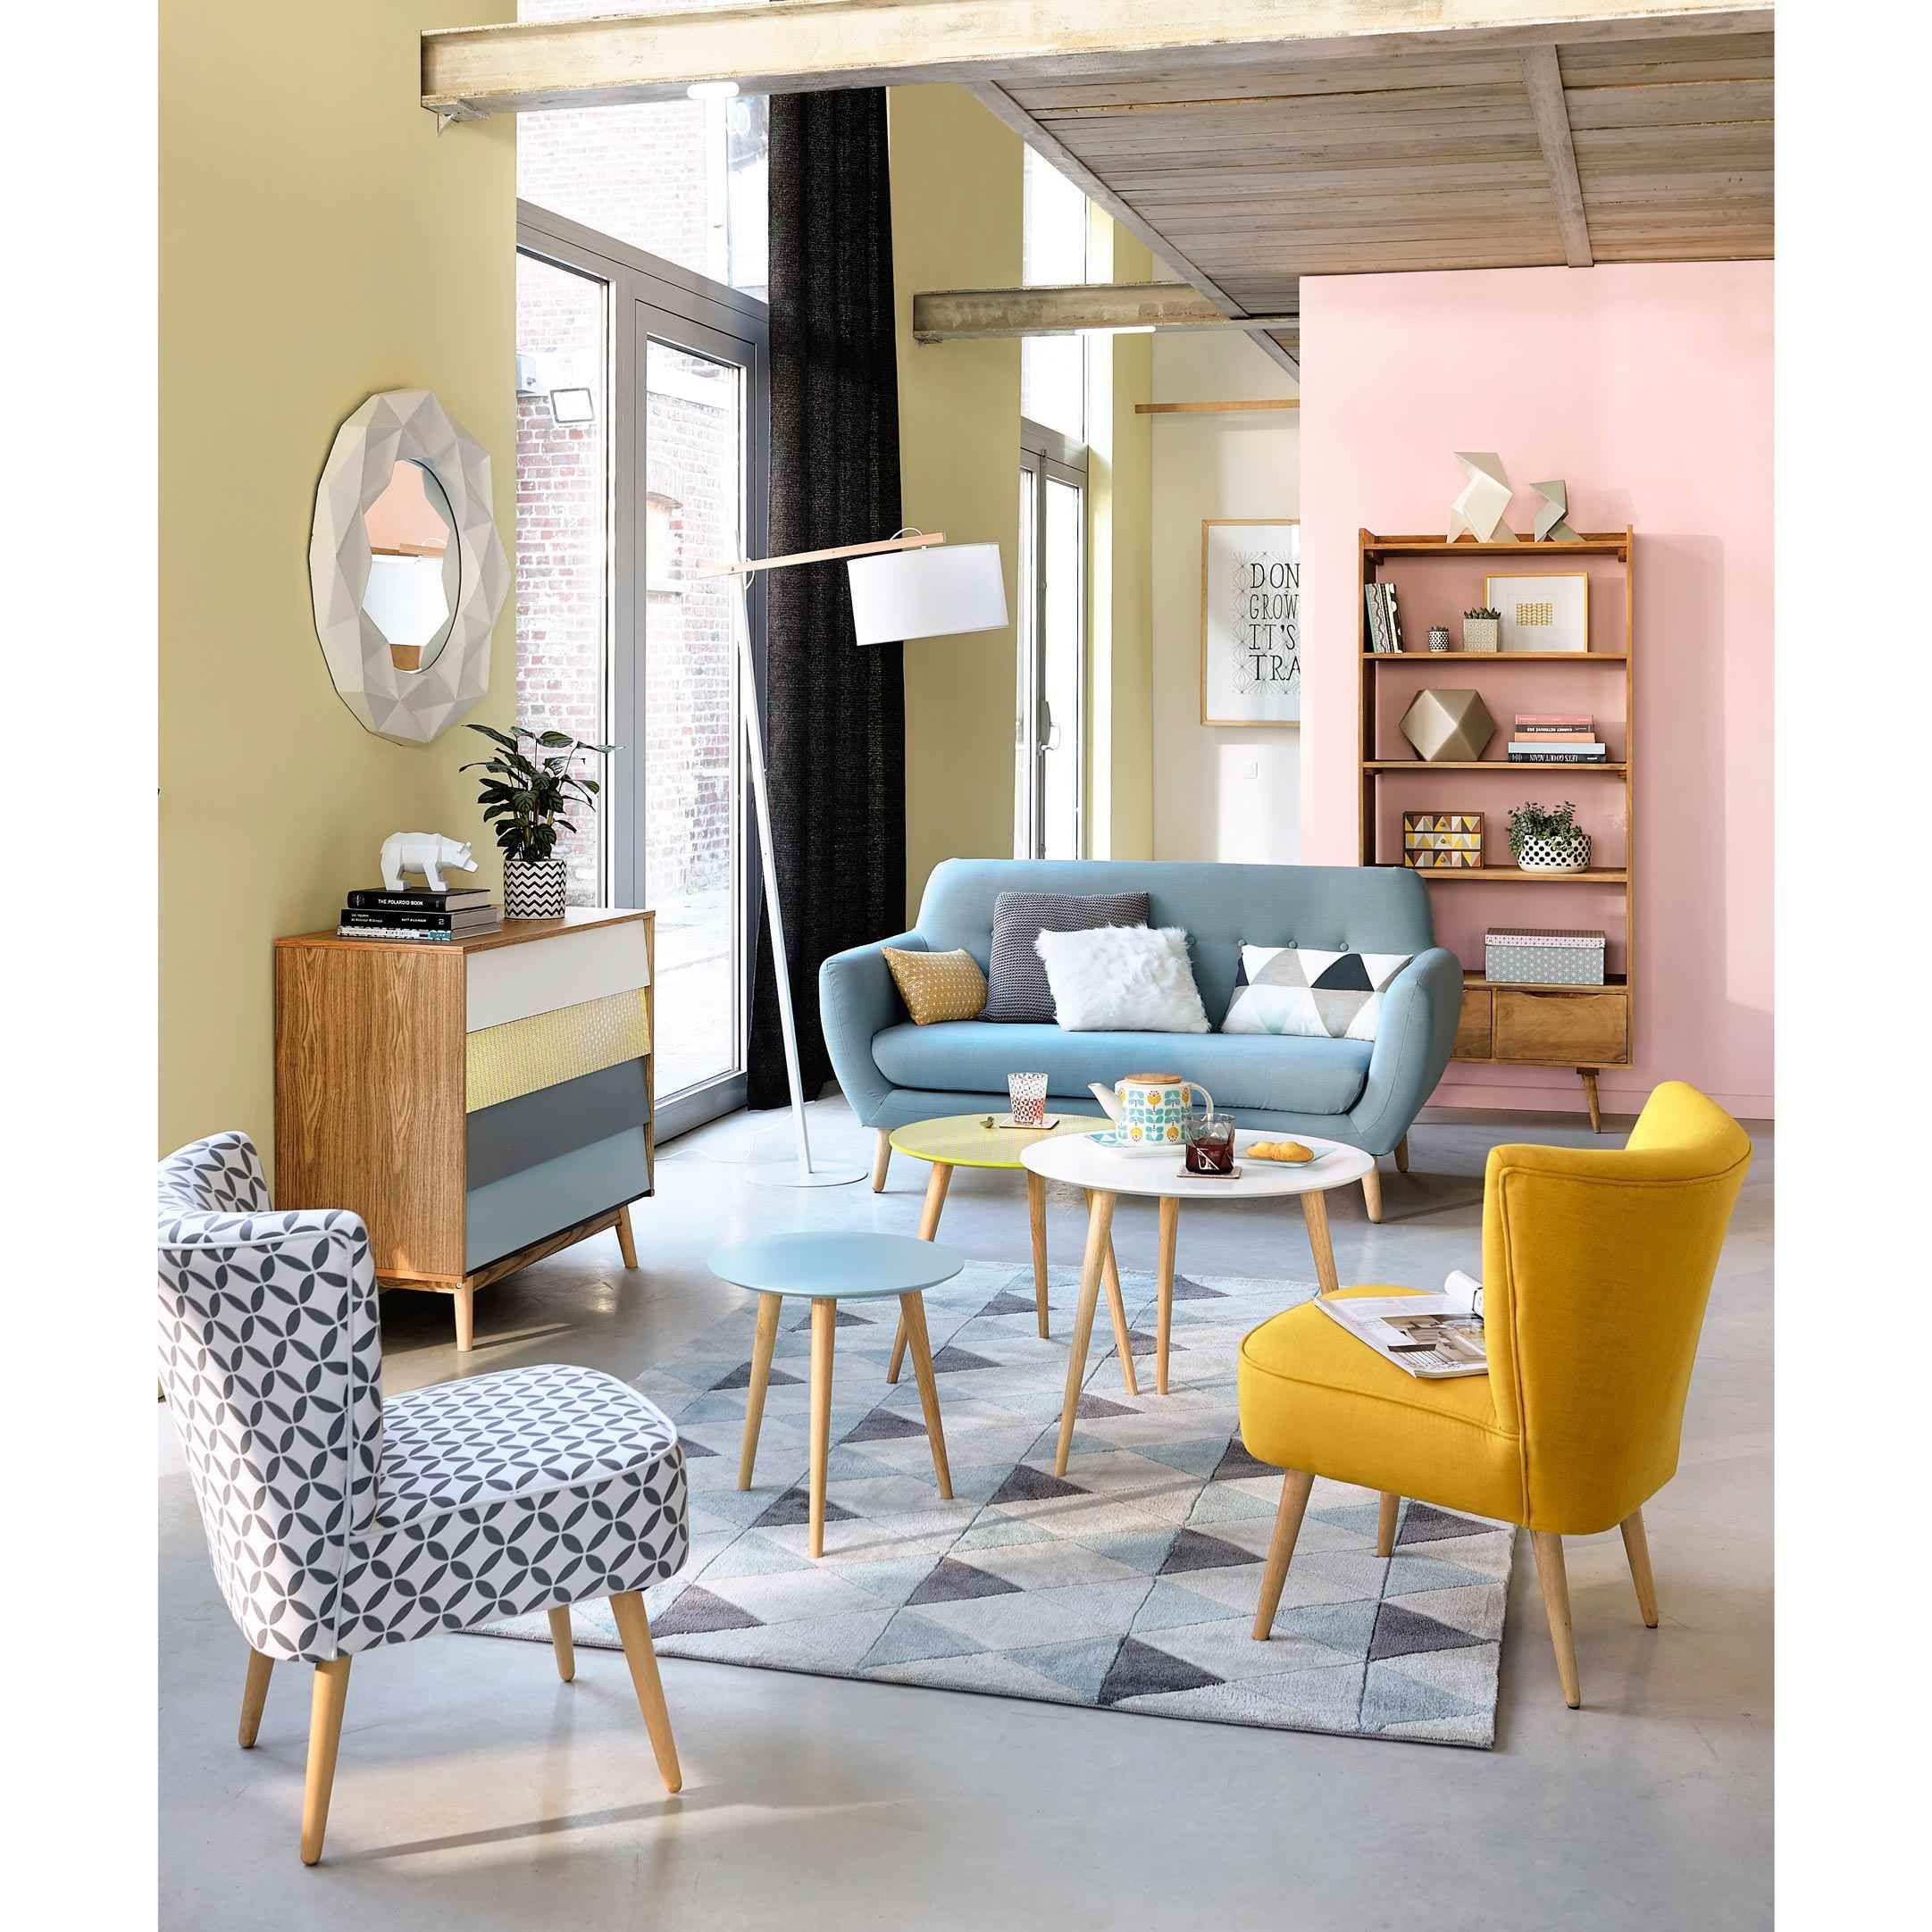 3 Tables Basses Gigognes Vintage En Bois Multicolores L 40 Cm A L 60 Cm Fjord Home Living Room Living Room Interior Interior Design Living Room